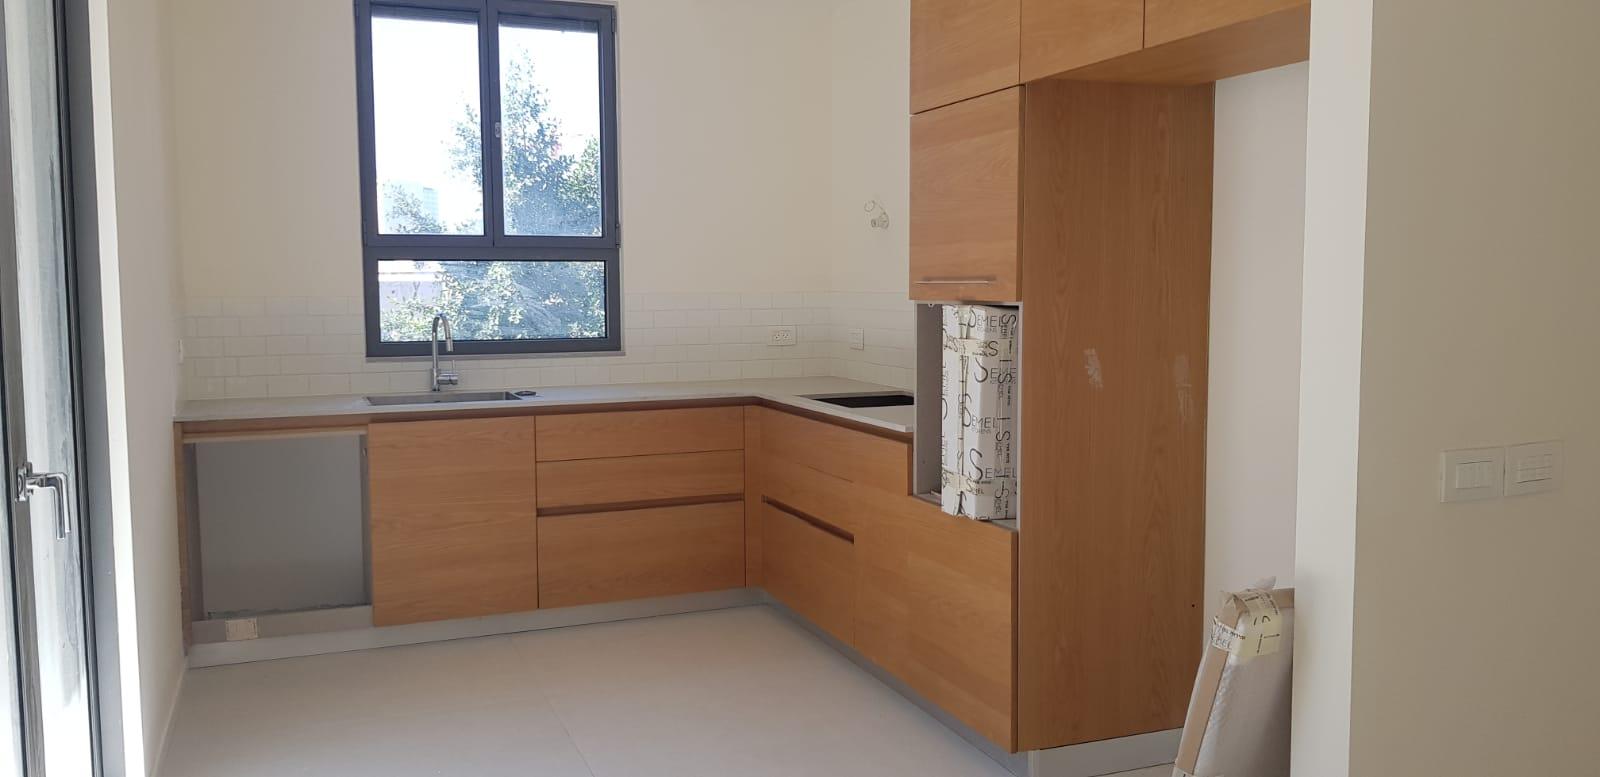 2 bedroom apartment on Grozenberg street